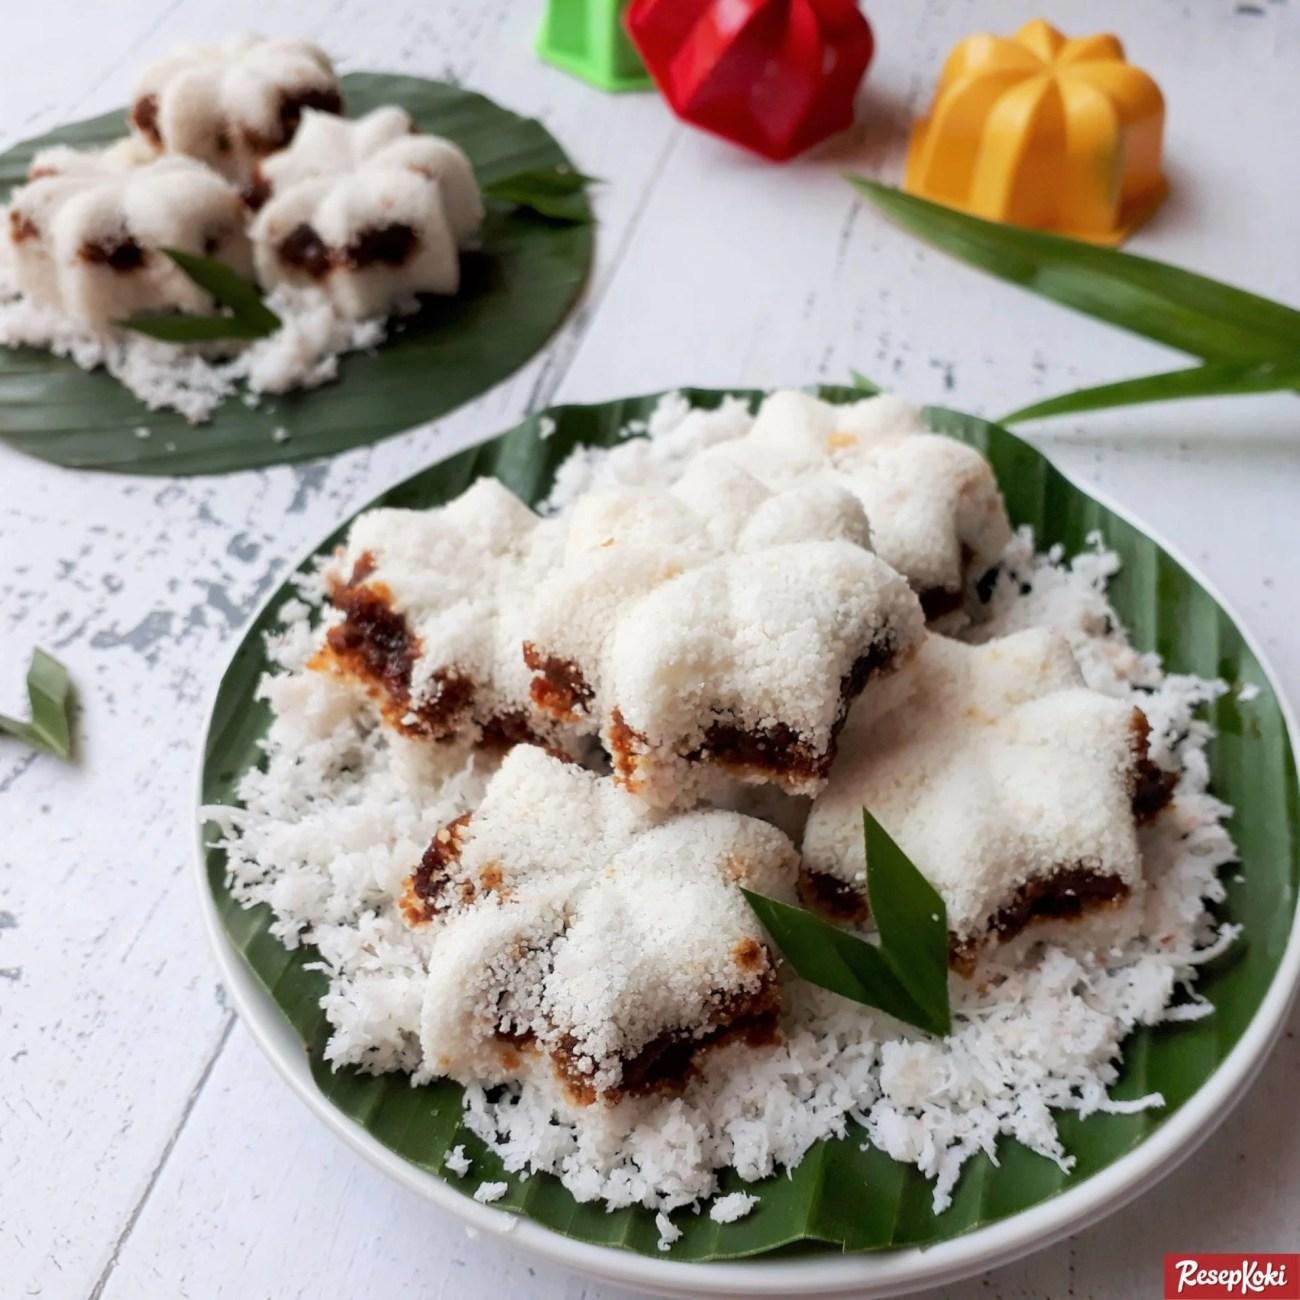 Kue Putu bambu tanpa cetakan